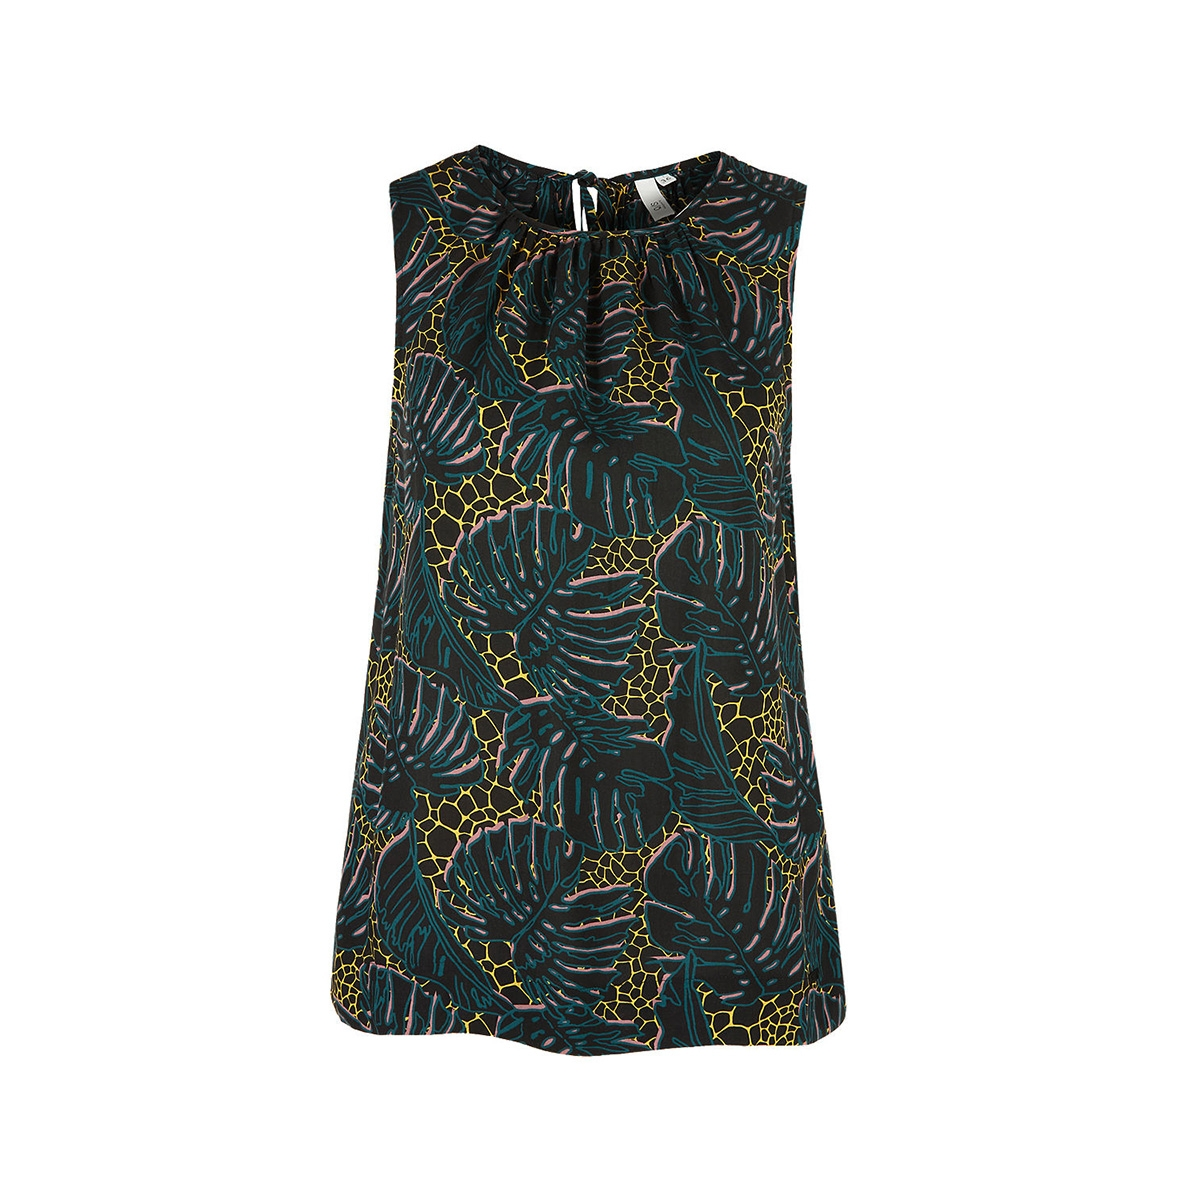 blousetop met bandjes in nek 41906133055 q/s designed by blouse 99a3